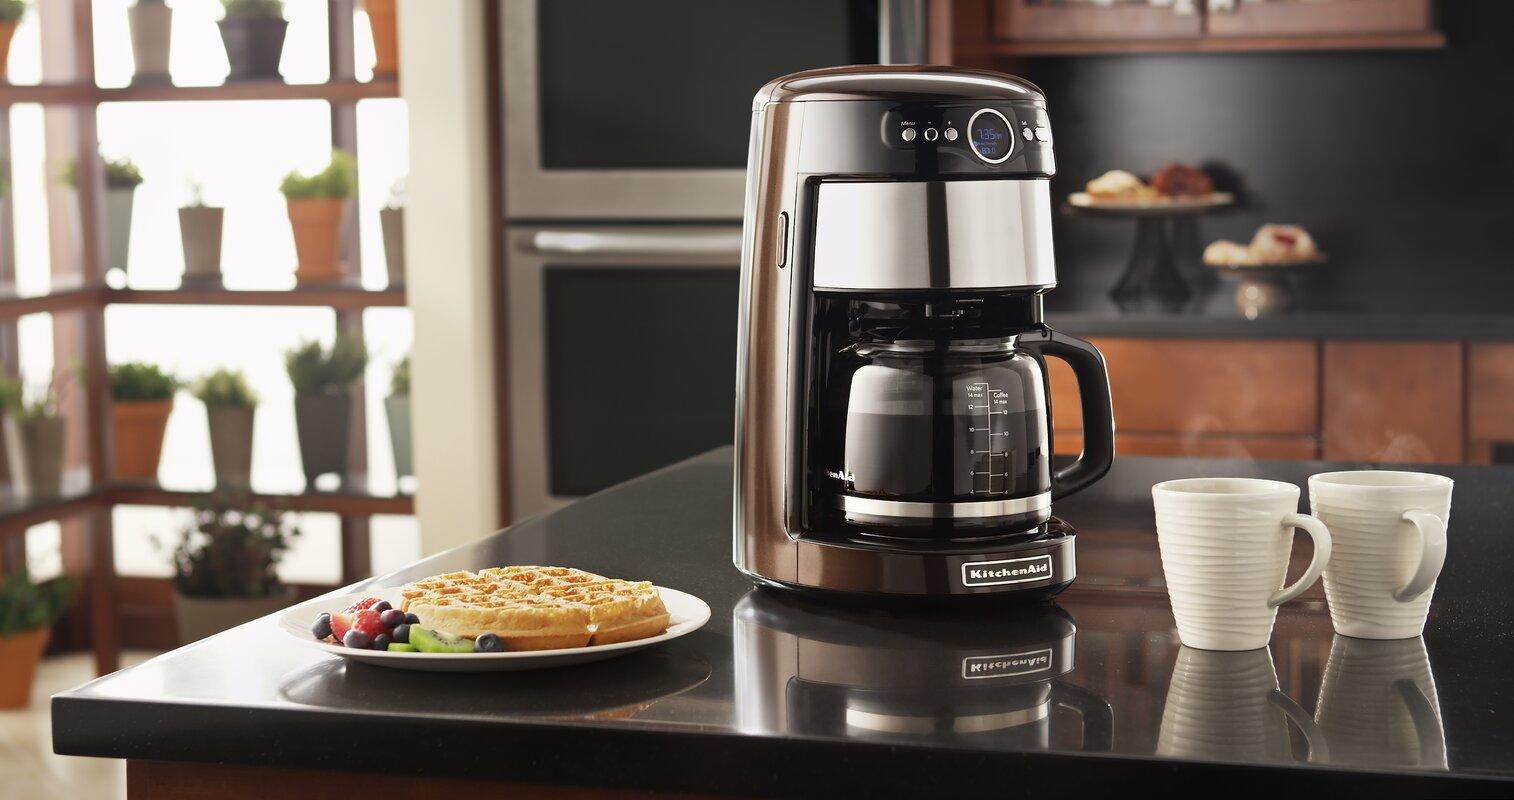 KitchenAid 14 Cup Glass Carafe Coffee Maker & Reviews | Wayfair